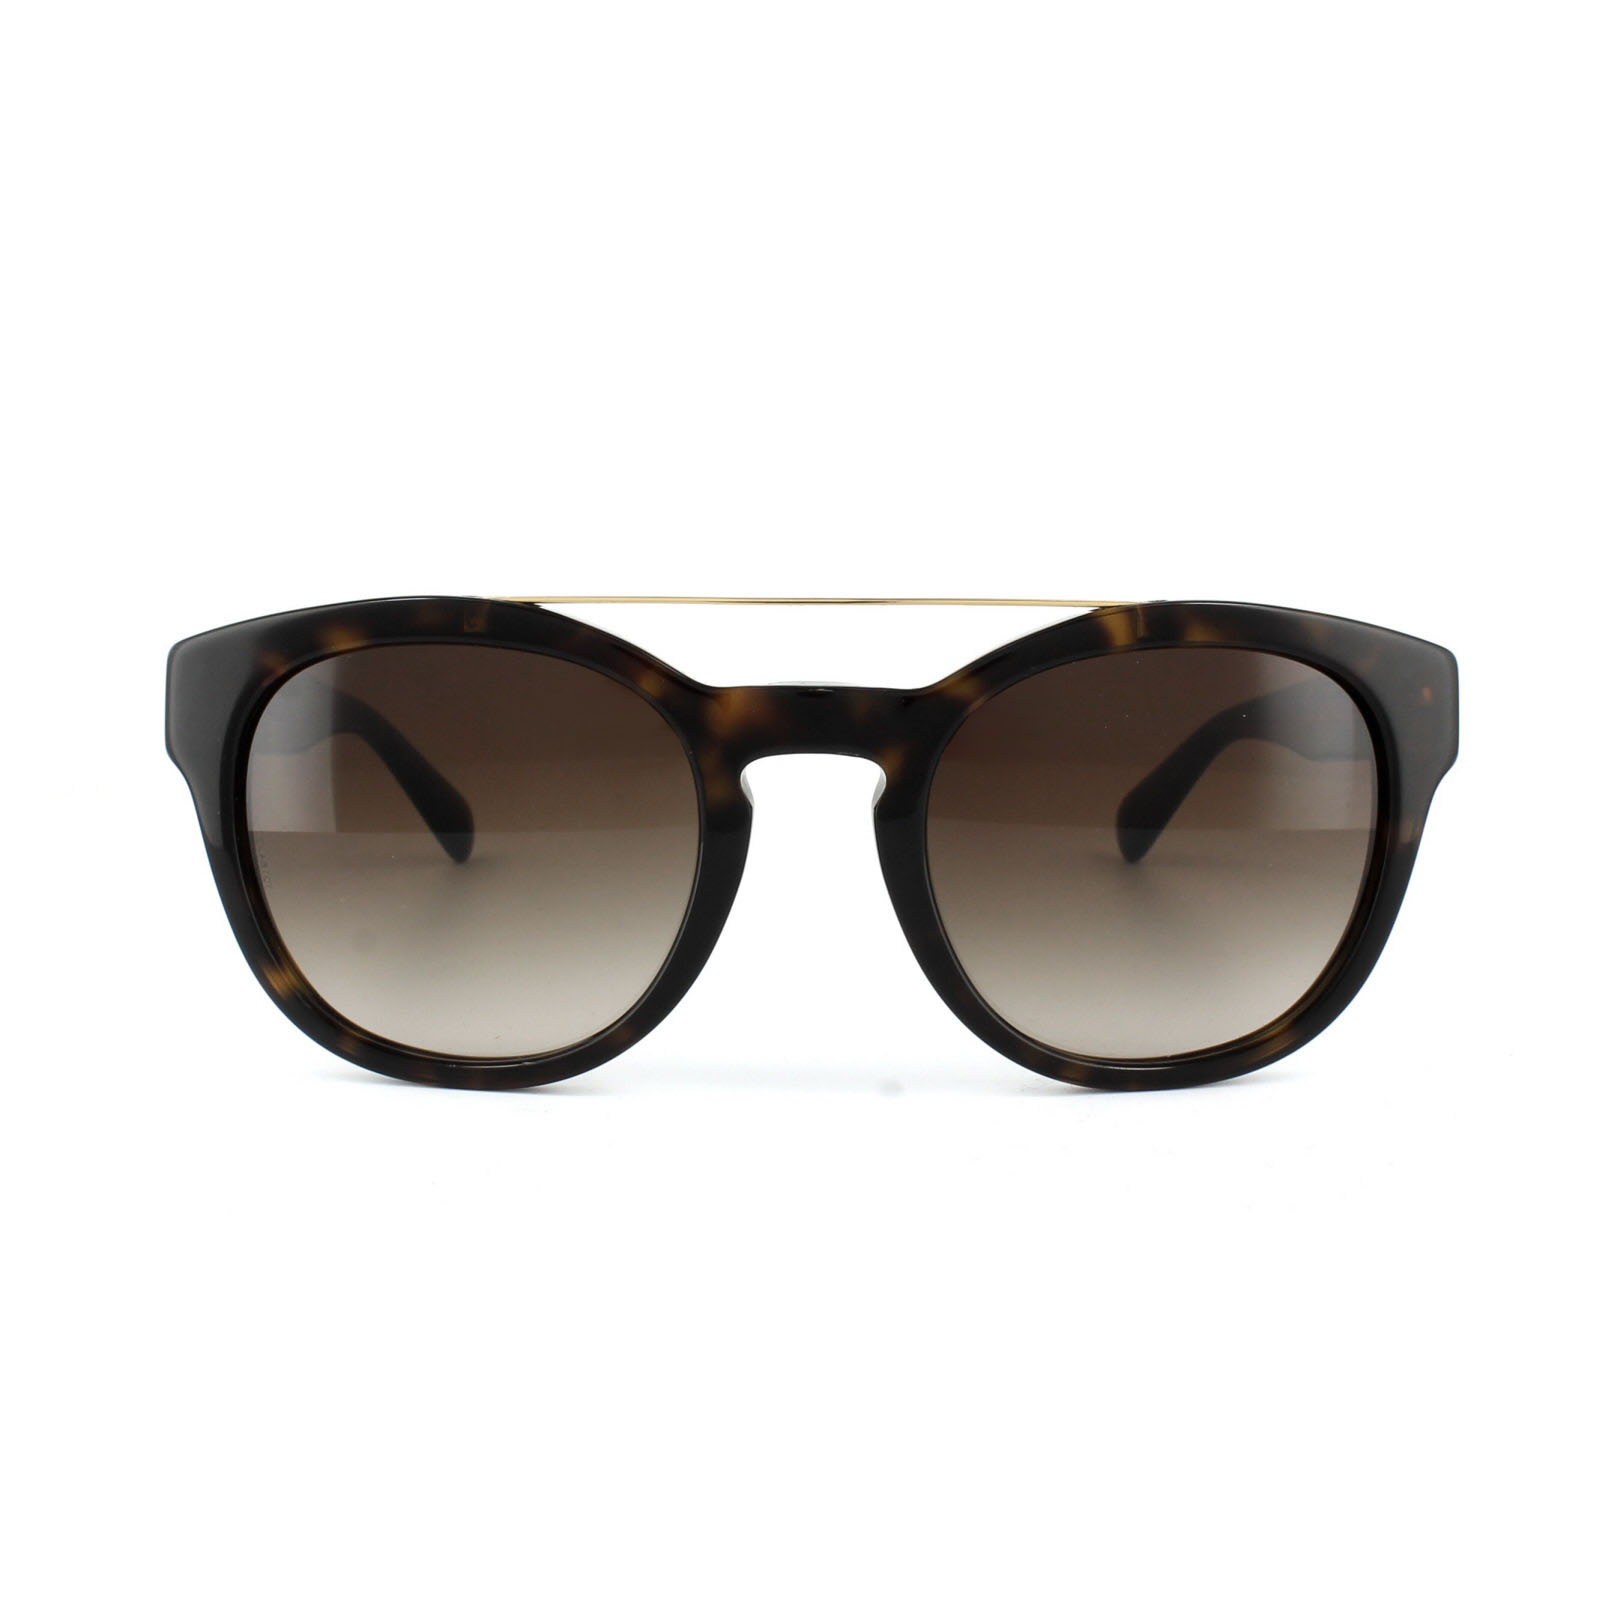 cheap dolce gabbana 4274 sunglasses discounted sunglasses